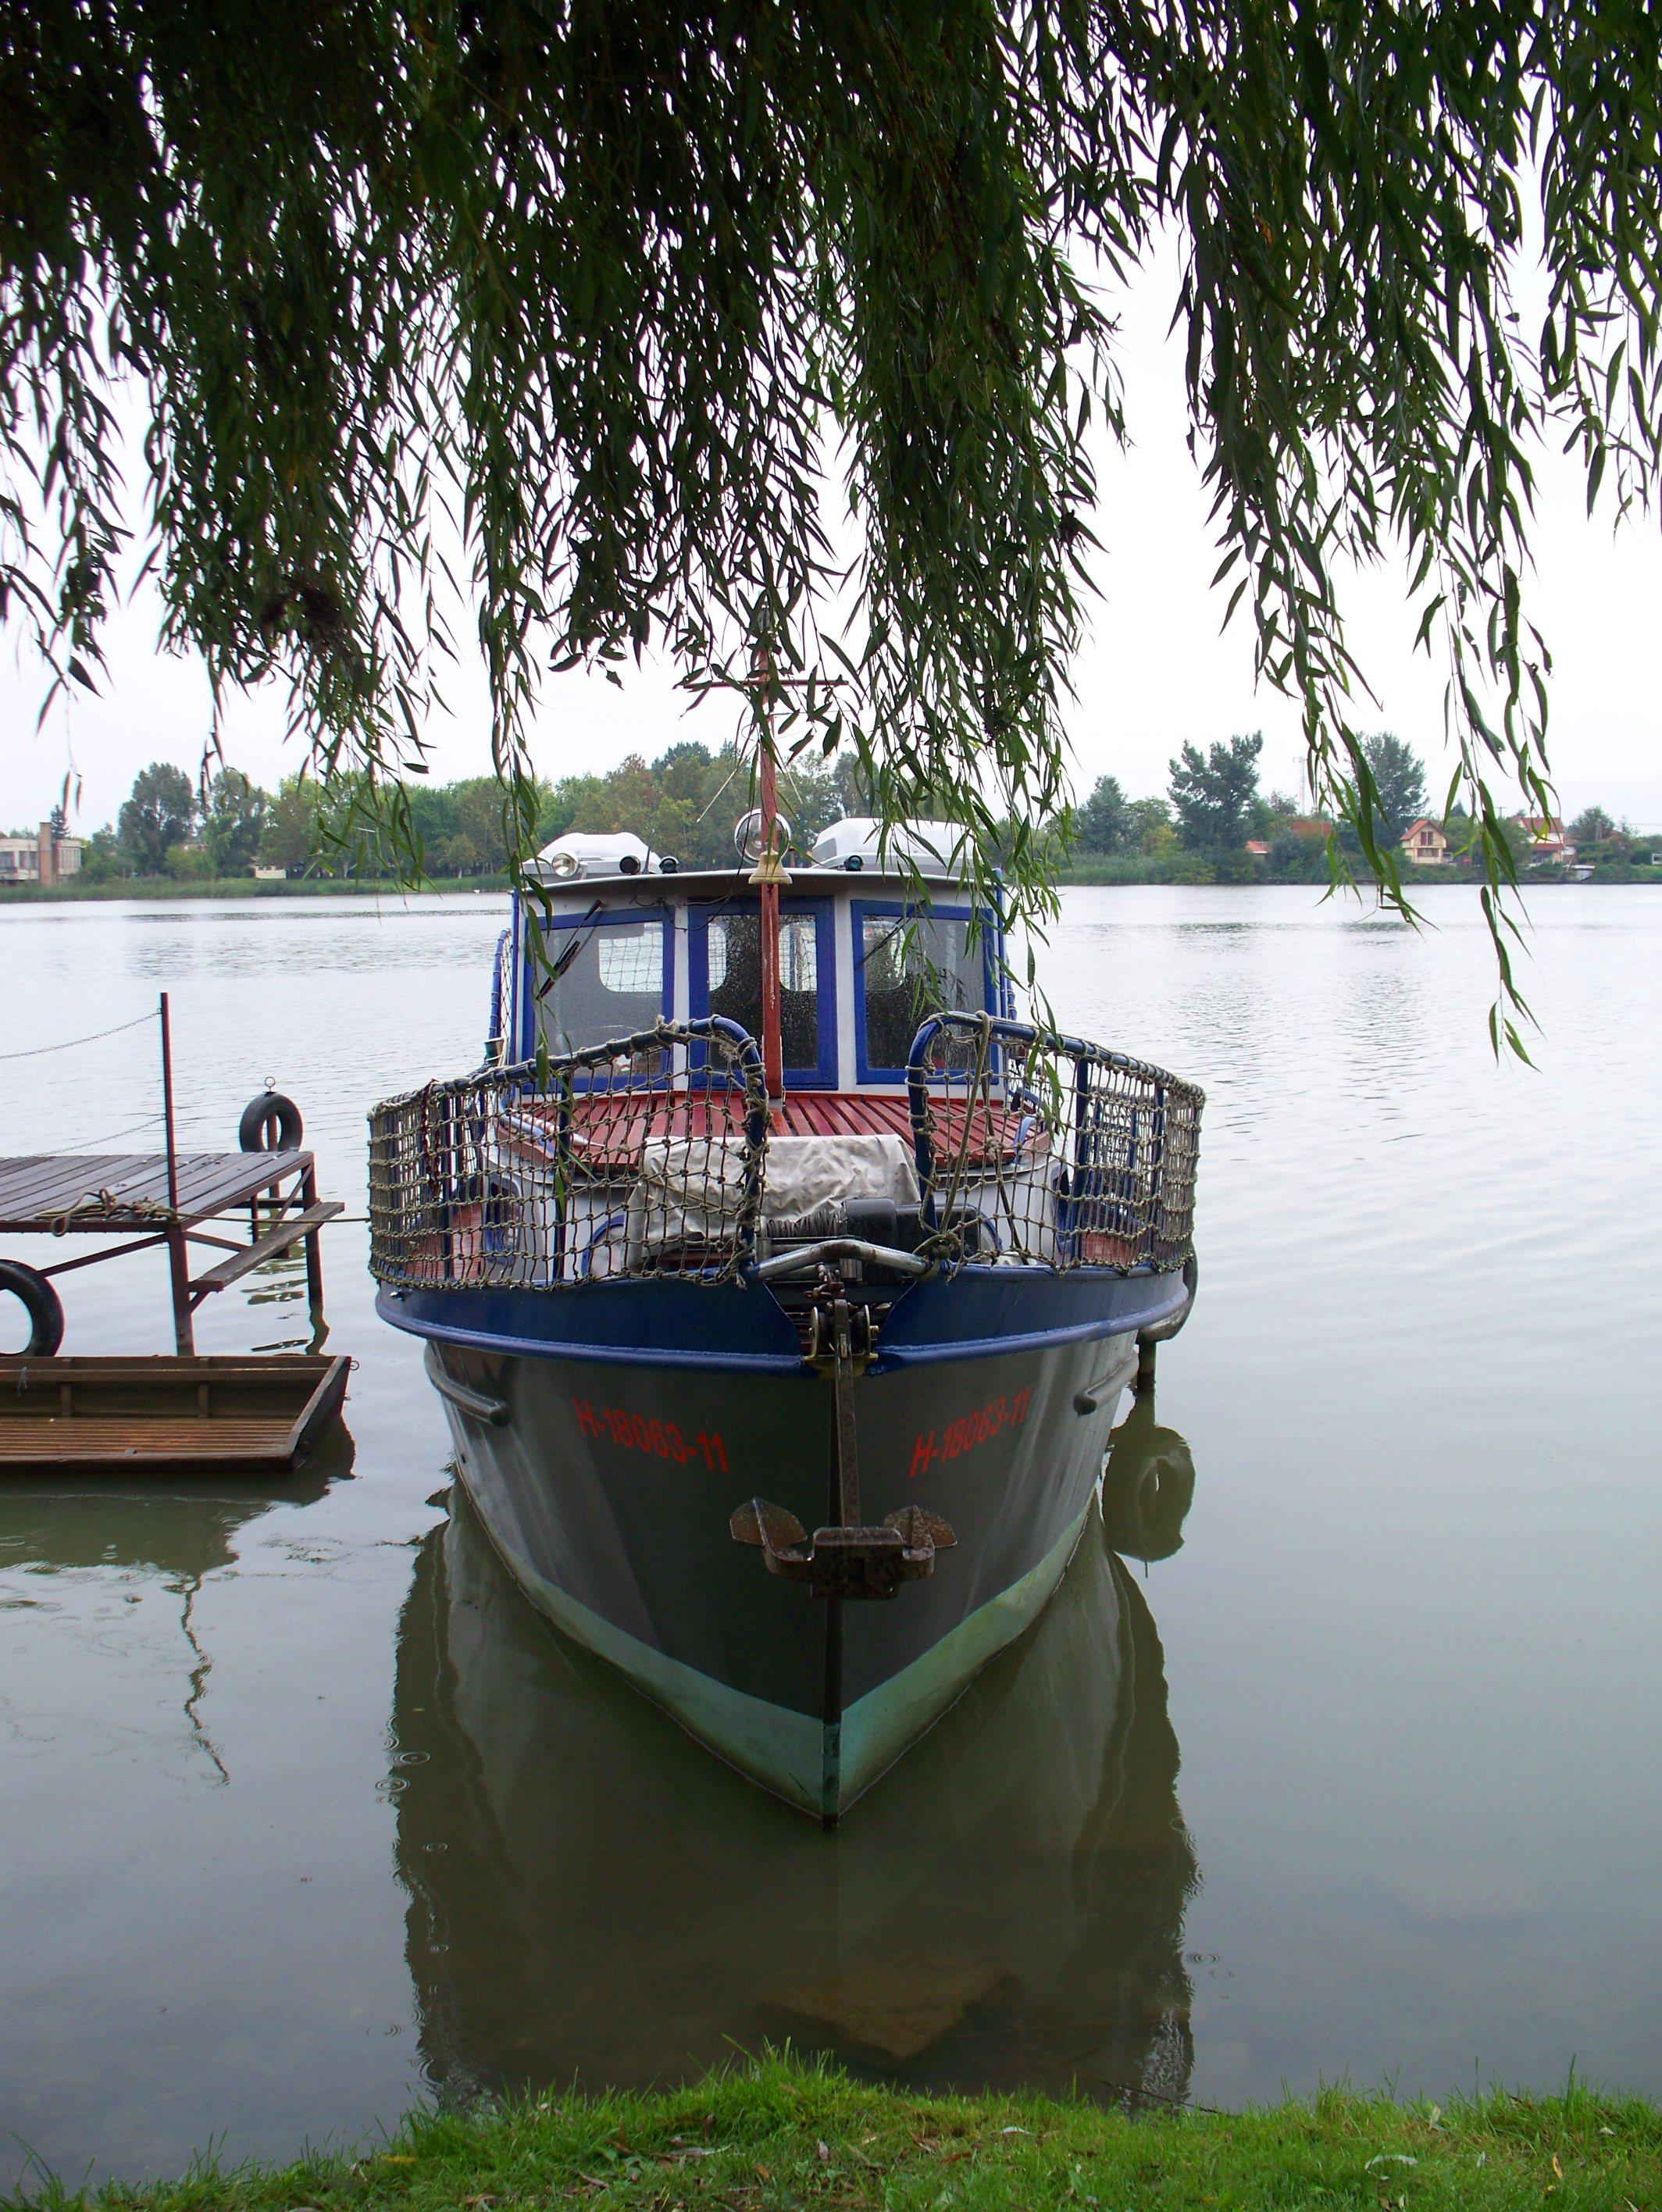 http://www.kisdunainagyhajok.hu/egyebhajok/2010_09_19_biene_lakohajo_aszok_napon_kikotve/2010_09_19_biene_lakohajo_aszok_napon_kikotve_006.jpg